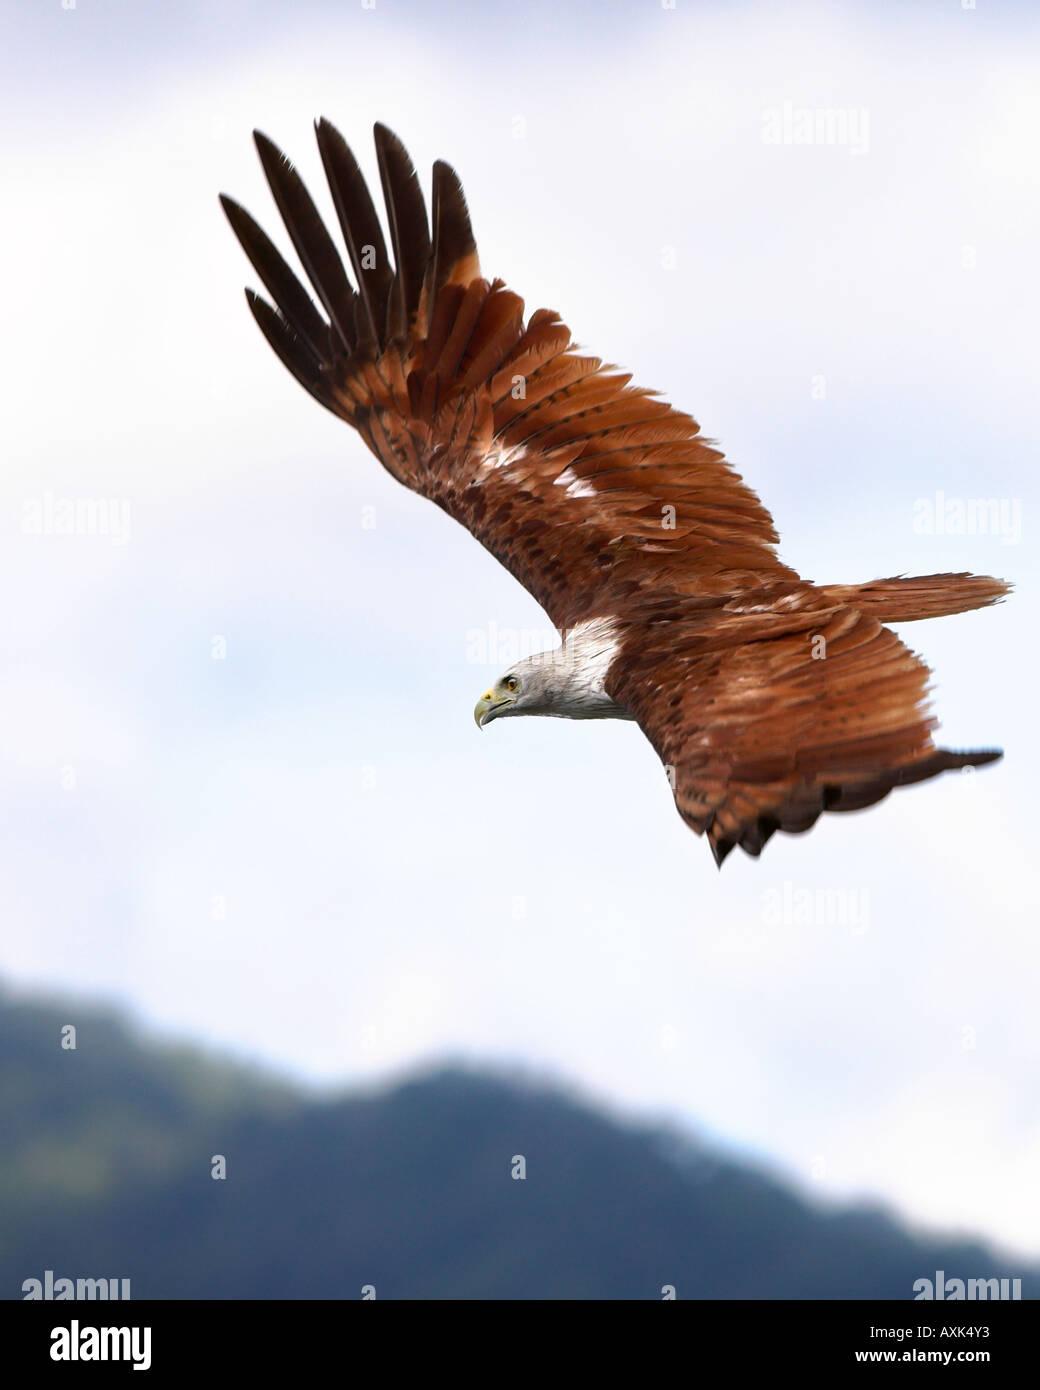 Eagle Brahminy Kite Langkawi Malaysia animal body bird wings span spread beak eye feathers high up in sky flying - Stock Image